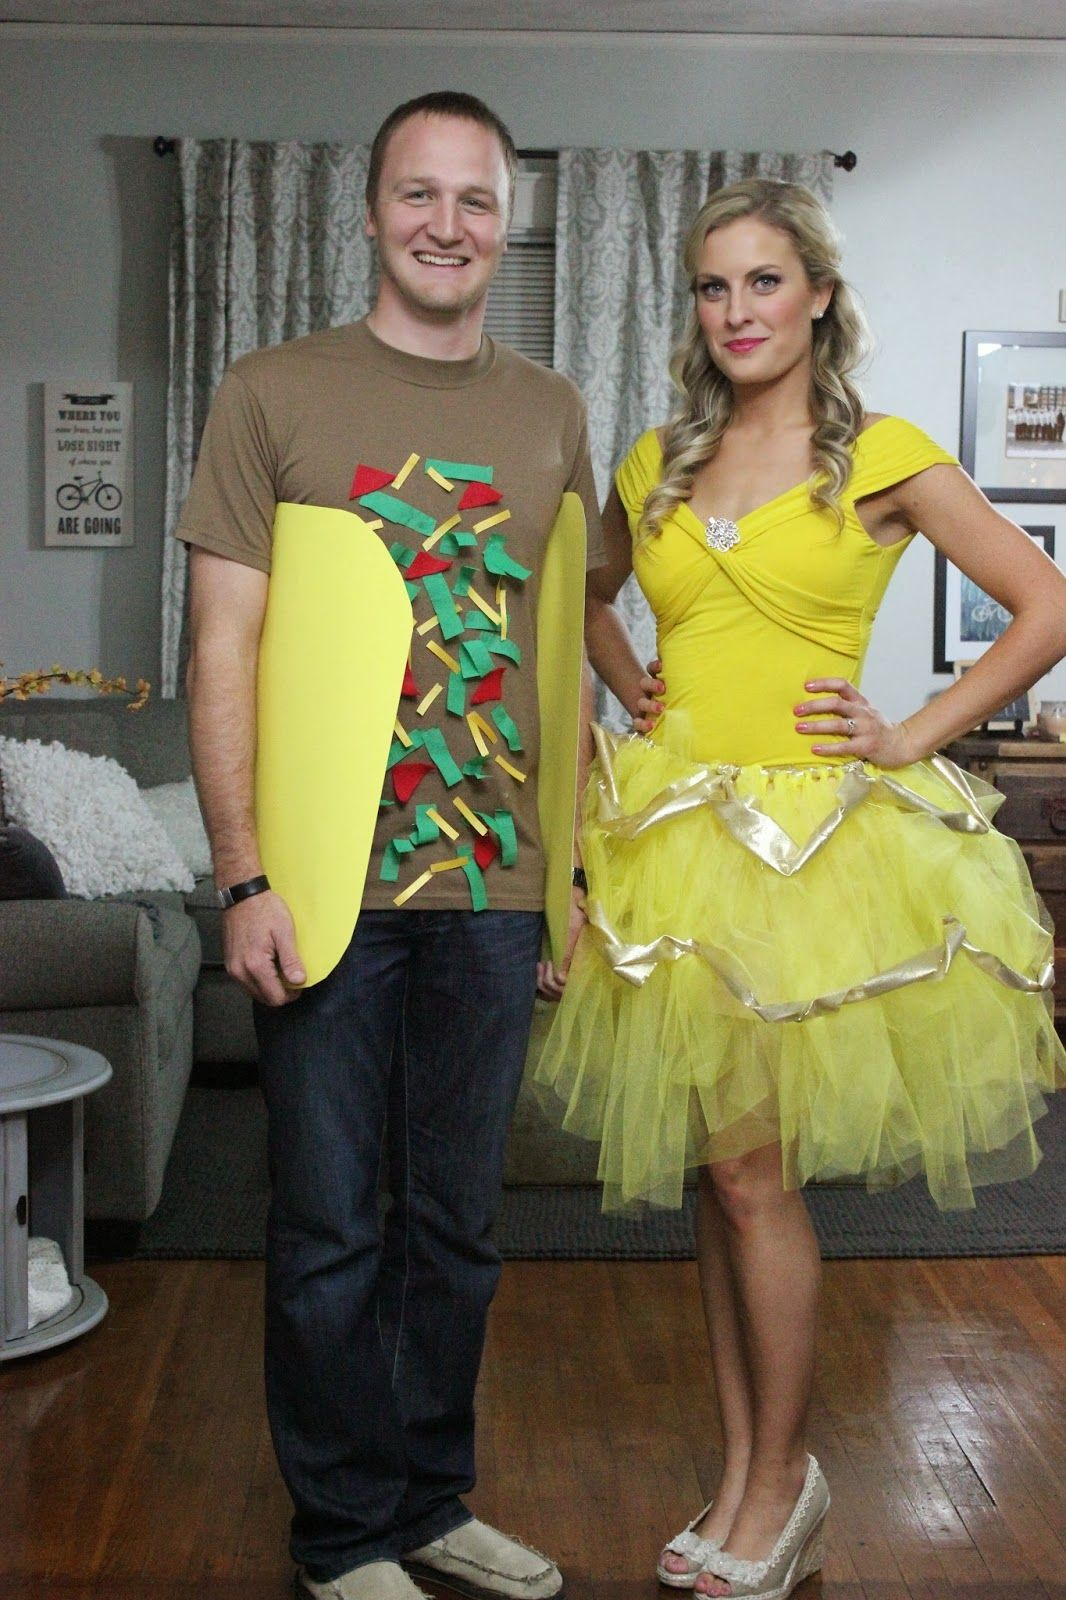 katie in kansas: diy couples halloween costume ideas. taco bell